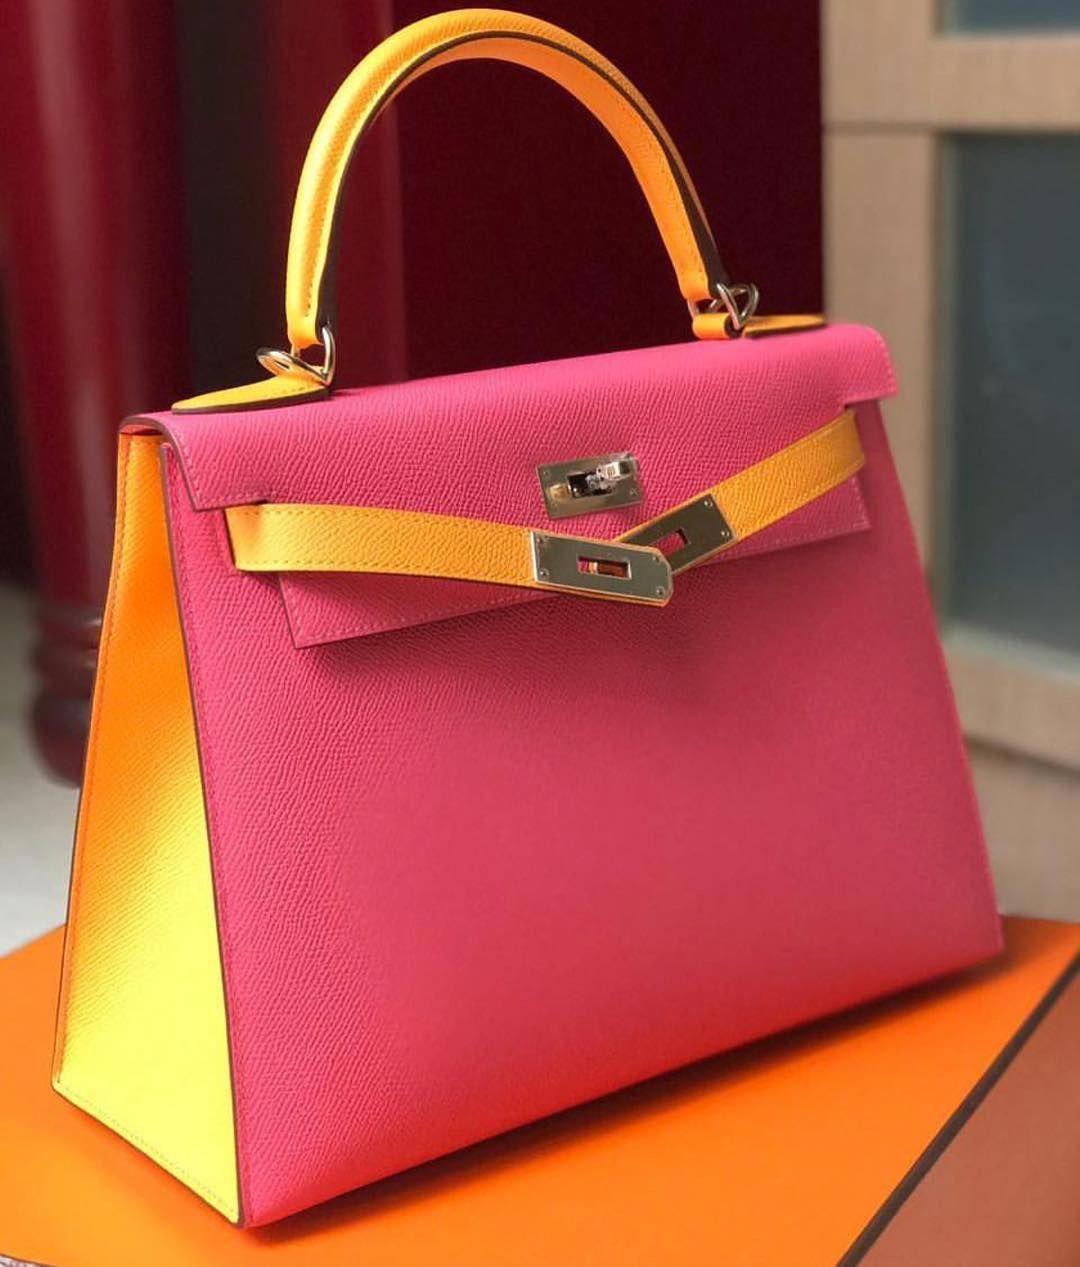 Photo of hermes handbags 2020 #Hermeshandbags